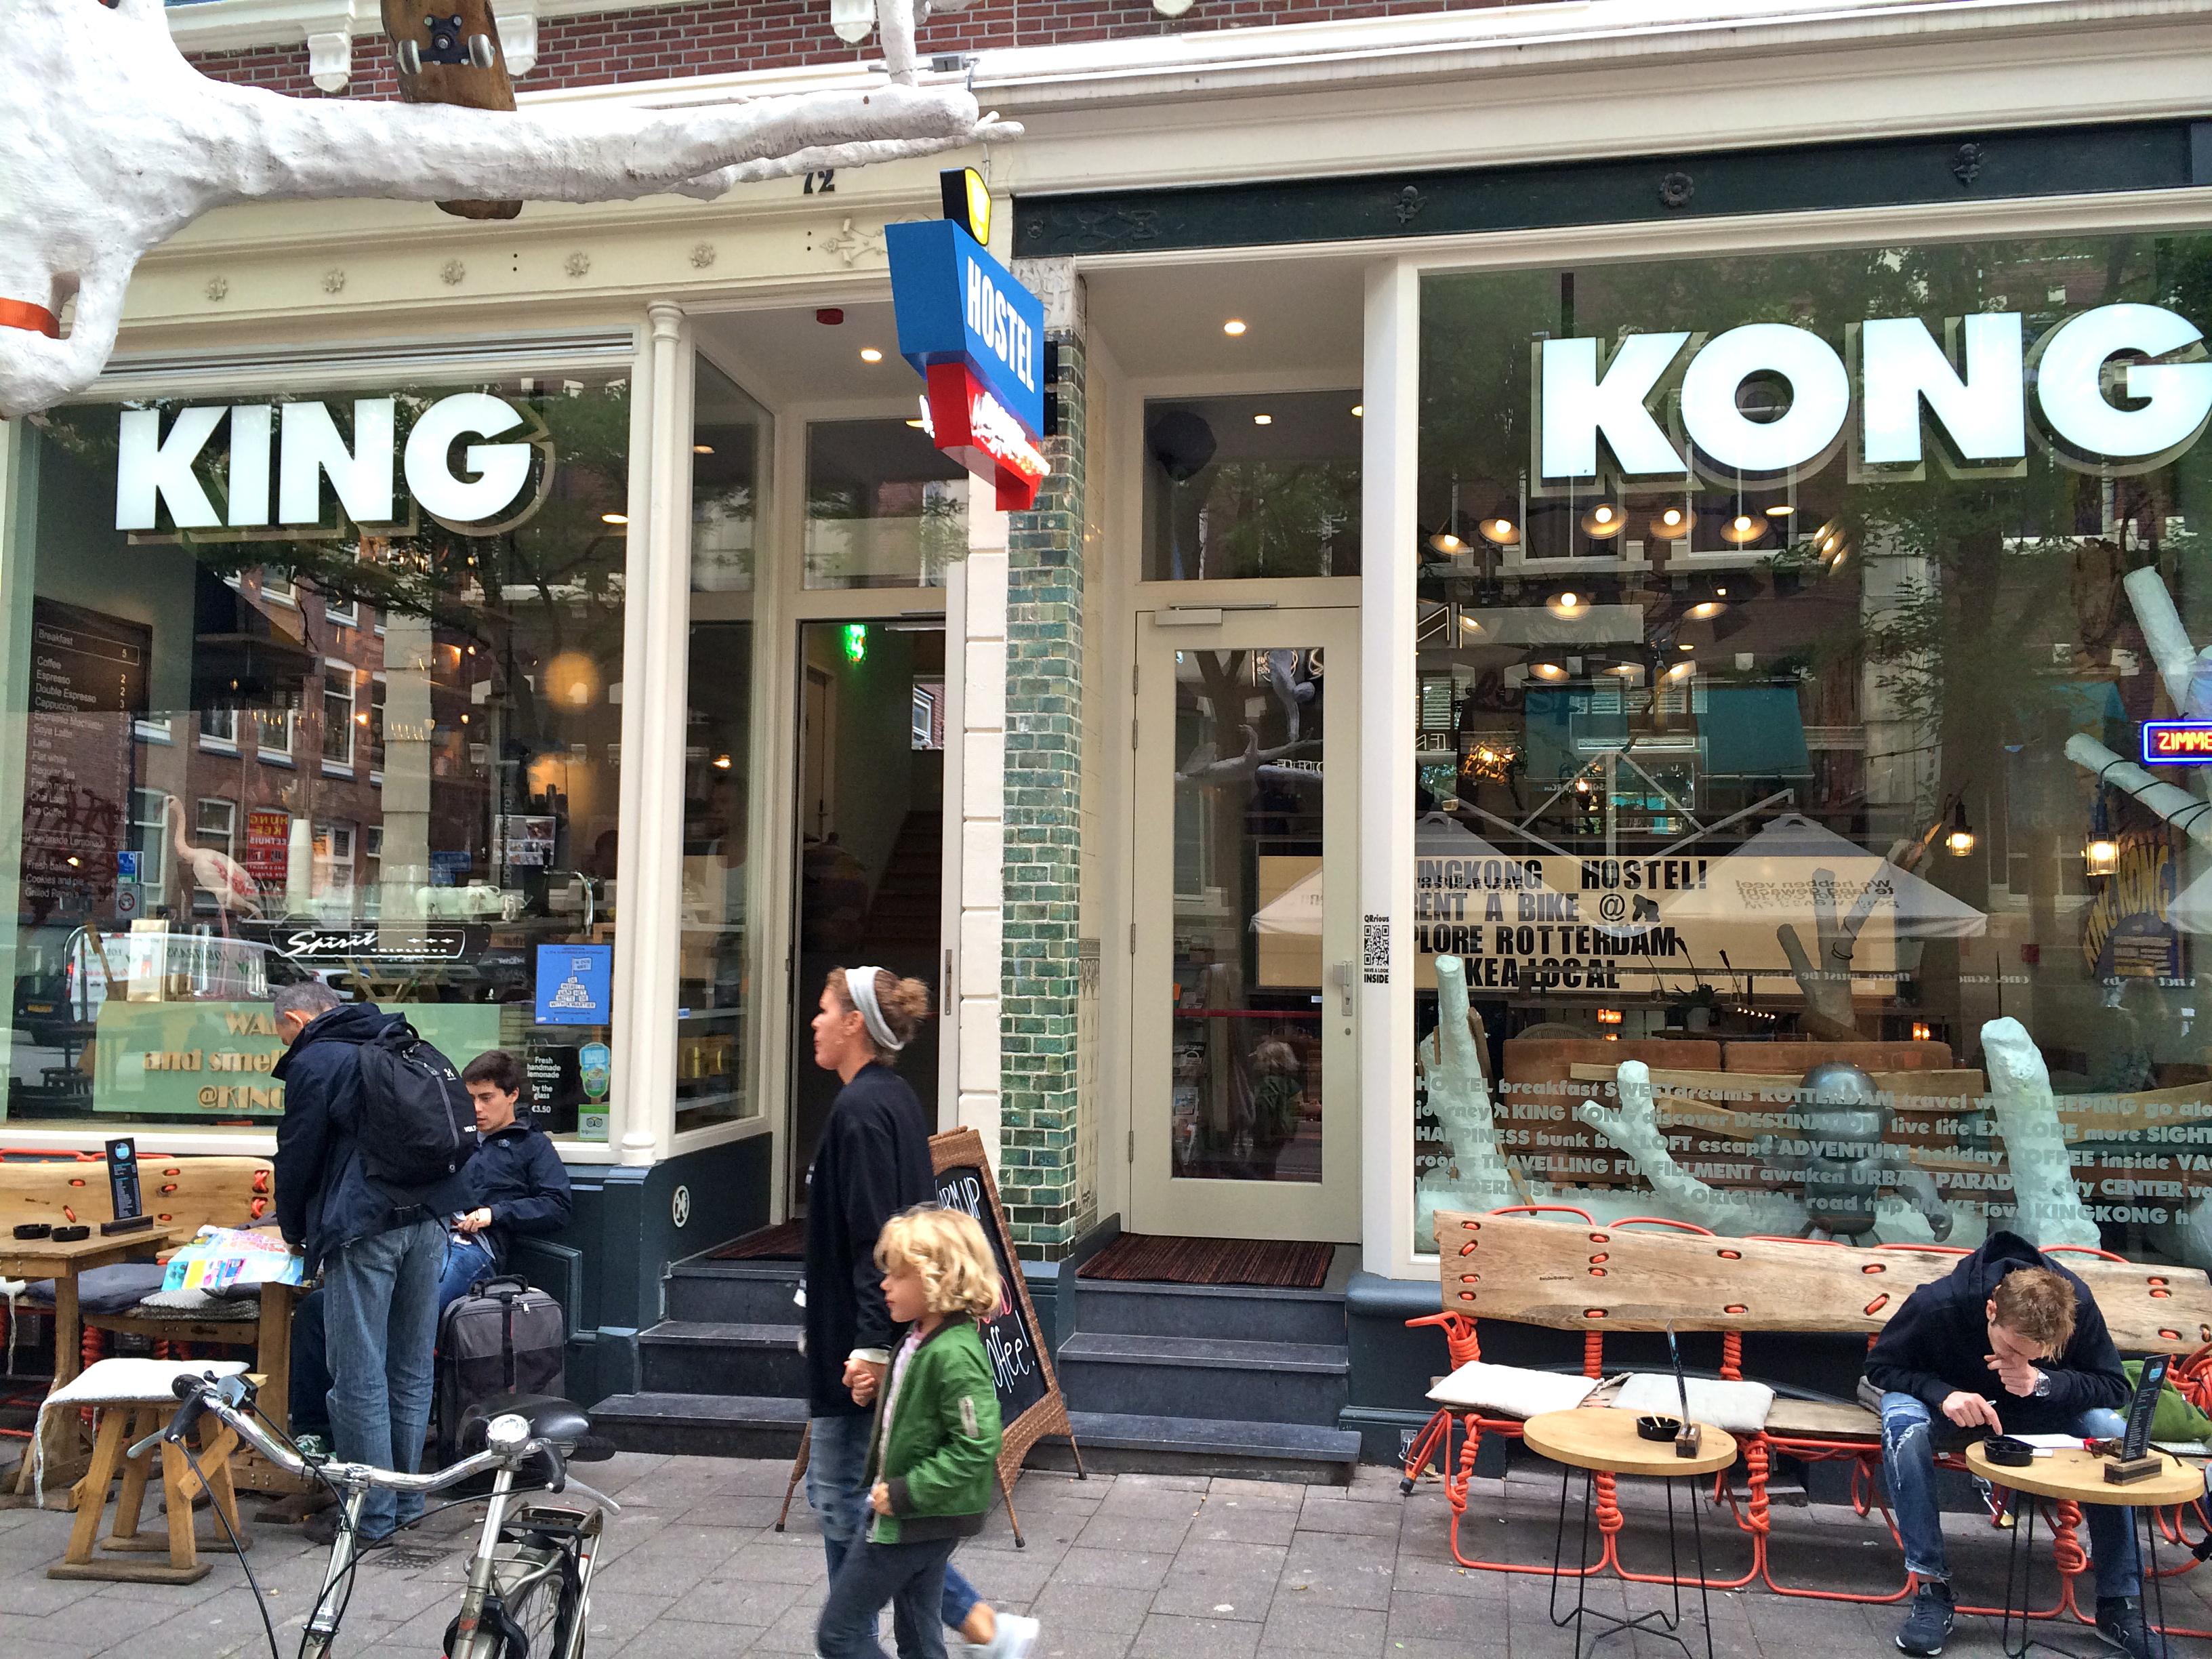 King-Kong-Hostel-Rotterdam